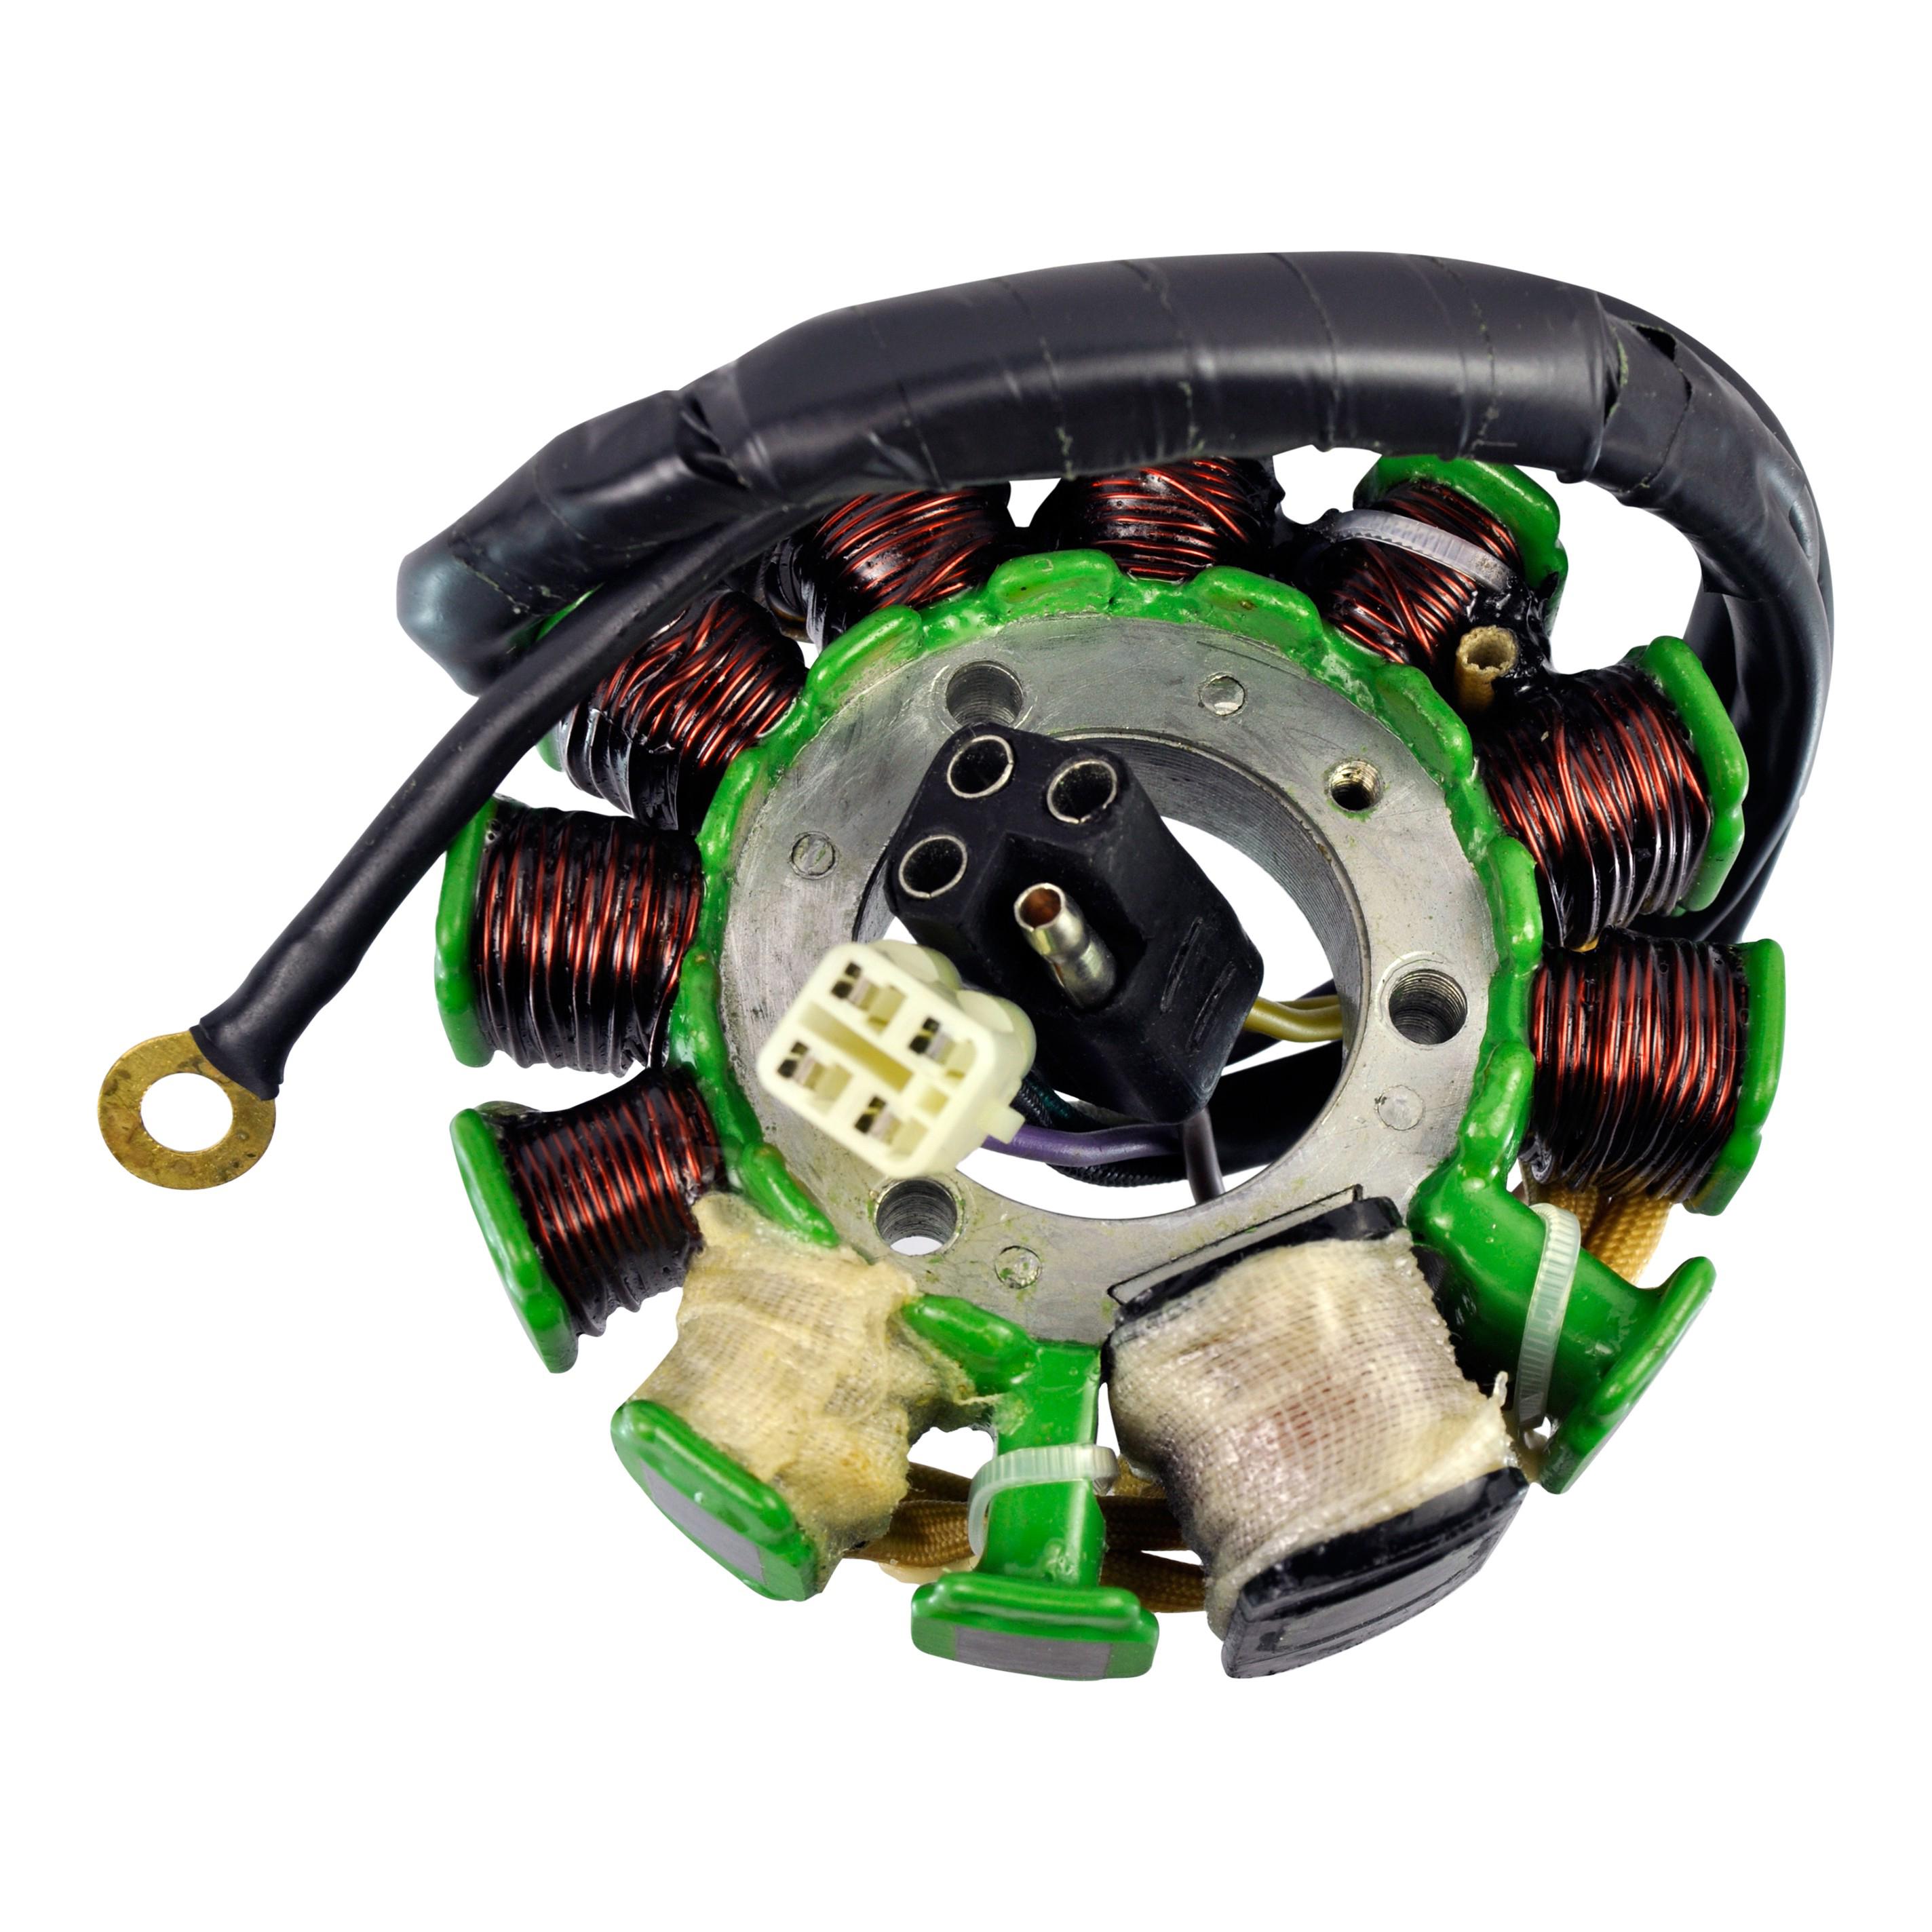 Details About Stator Coil Alternator For Arctic Cat Pantera 800 1998 99 Thundercat 93